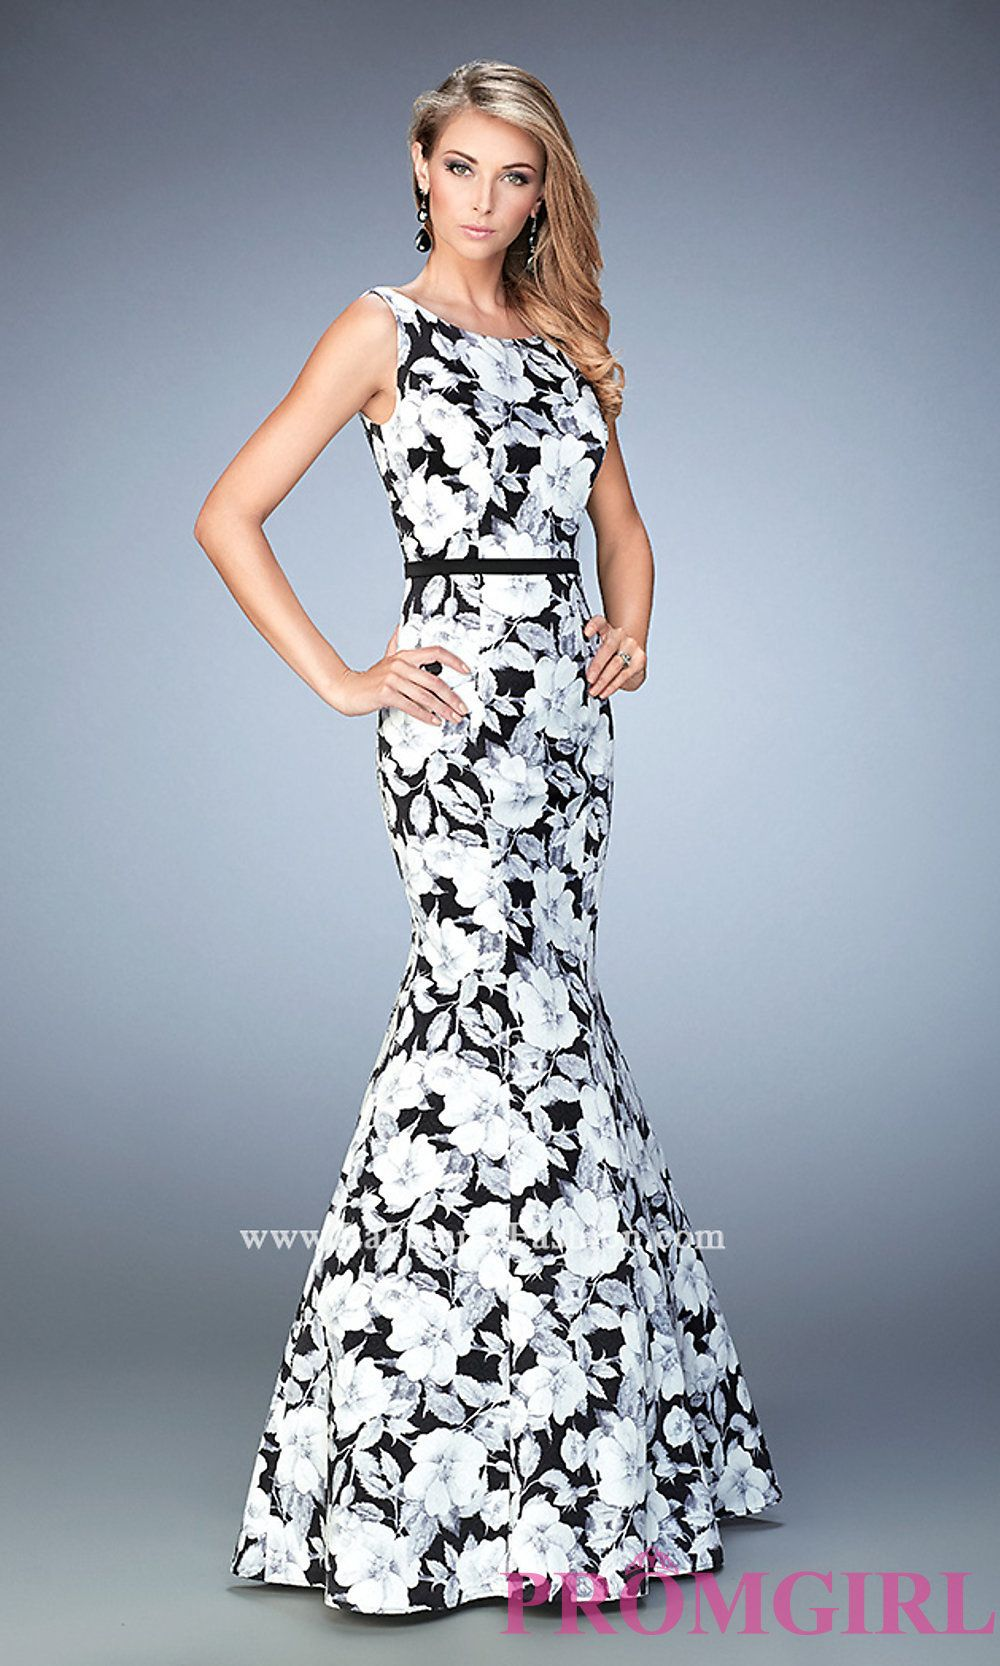 69e2aaa6b44 Long La Femme Black and White Print Mermaid Prom Dress Style  LF-22494